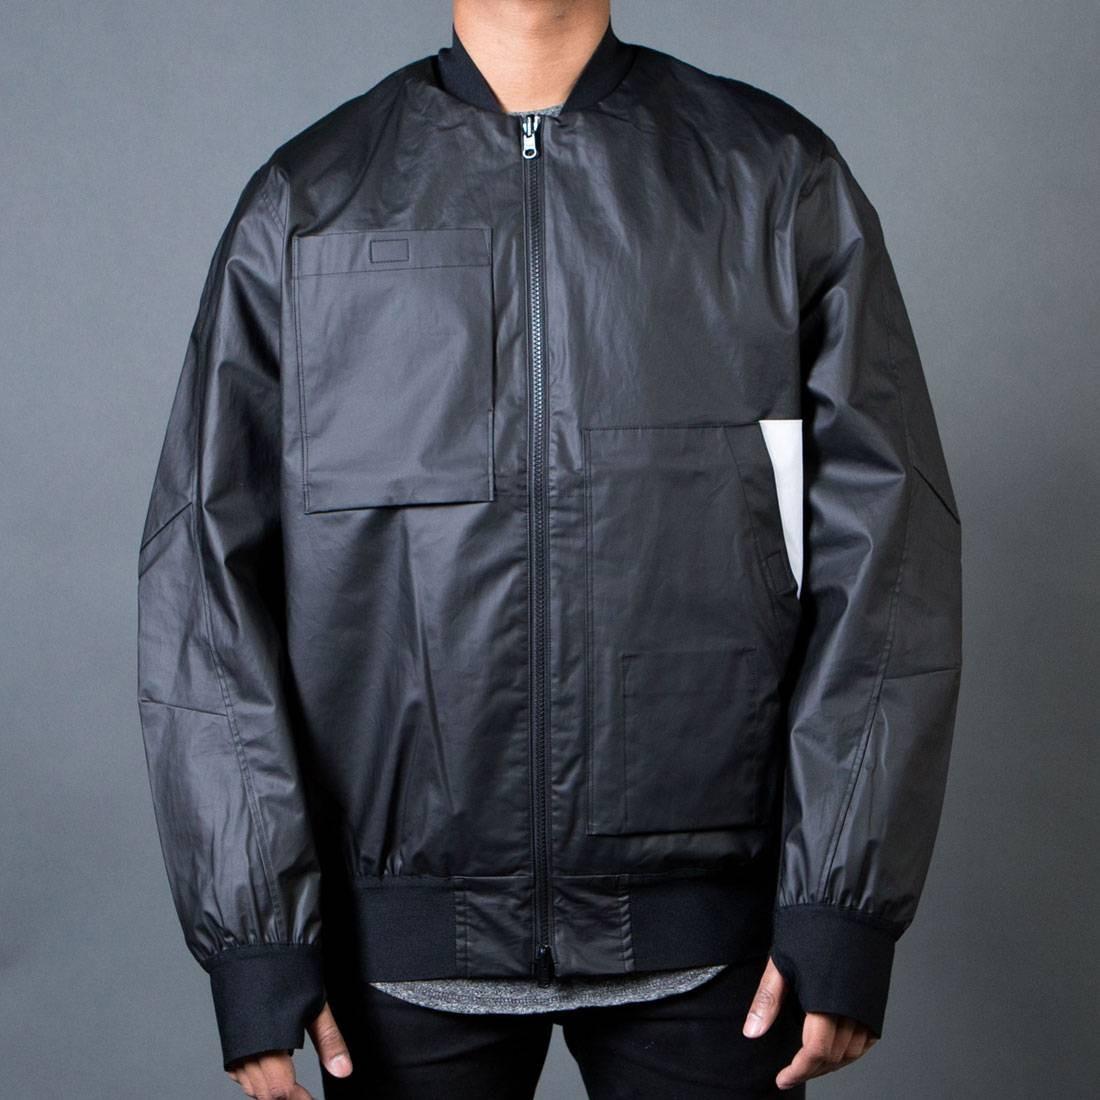 Adidas Y-3 Men Versa Bomber Jacket (black)